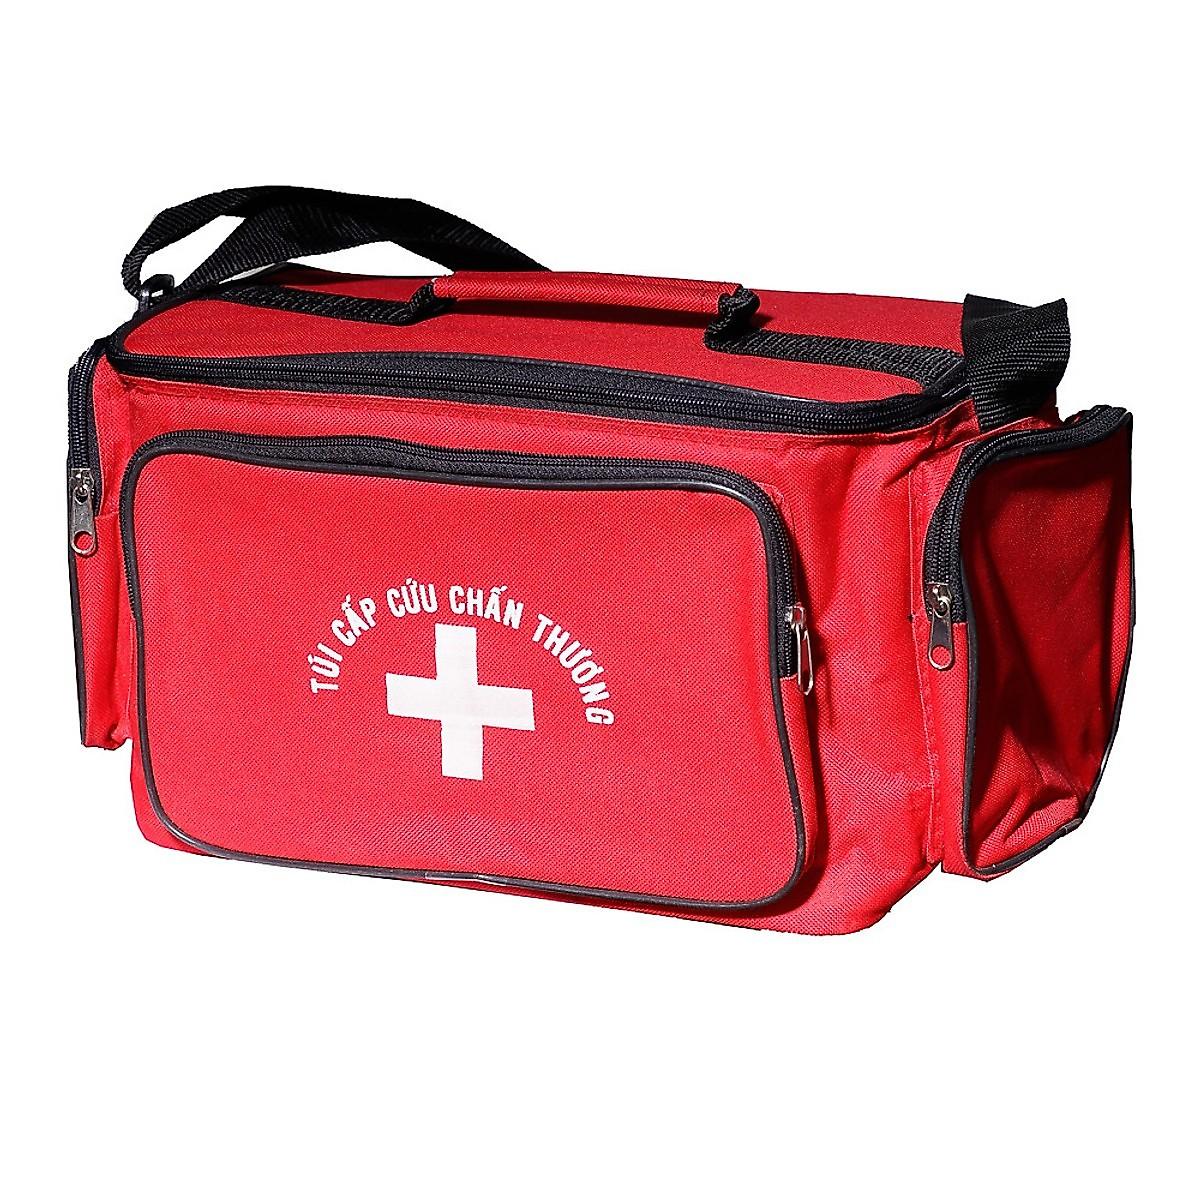 Túi y tế đỏ size L